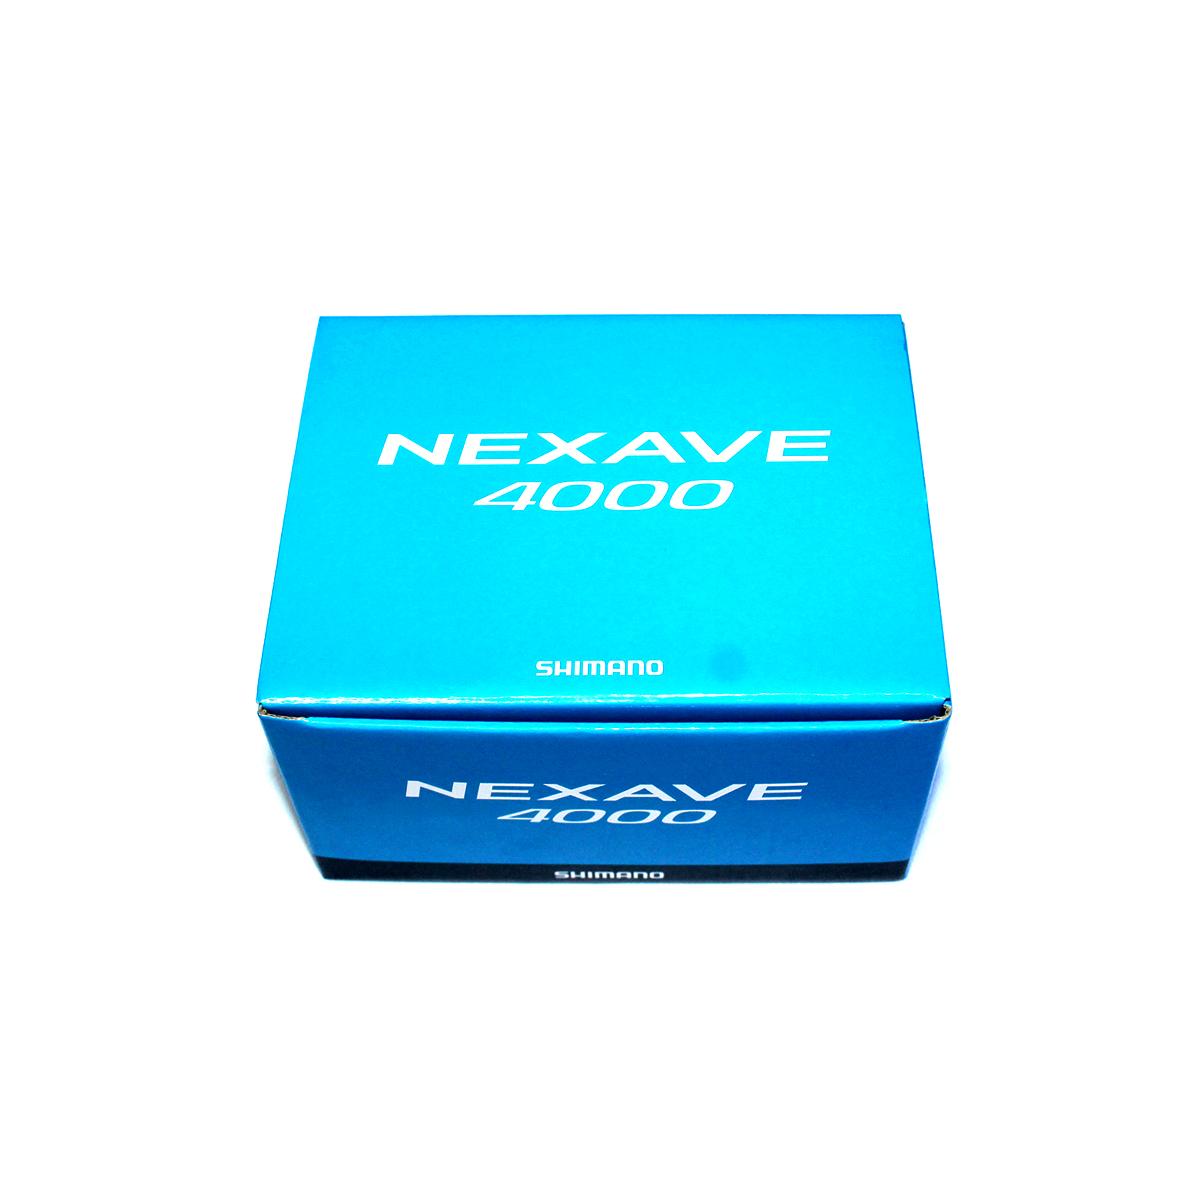 Máy Câu Cá Shimano Nexave 4000 - Bảo Hành 6 Tháng